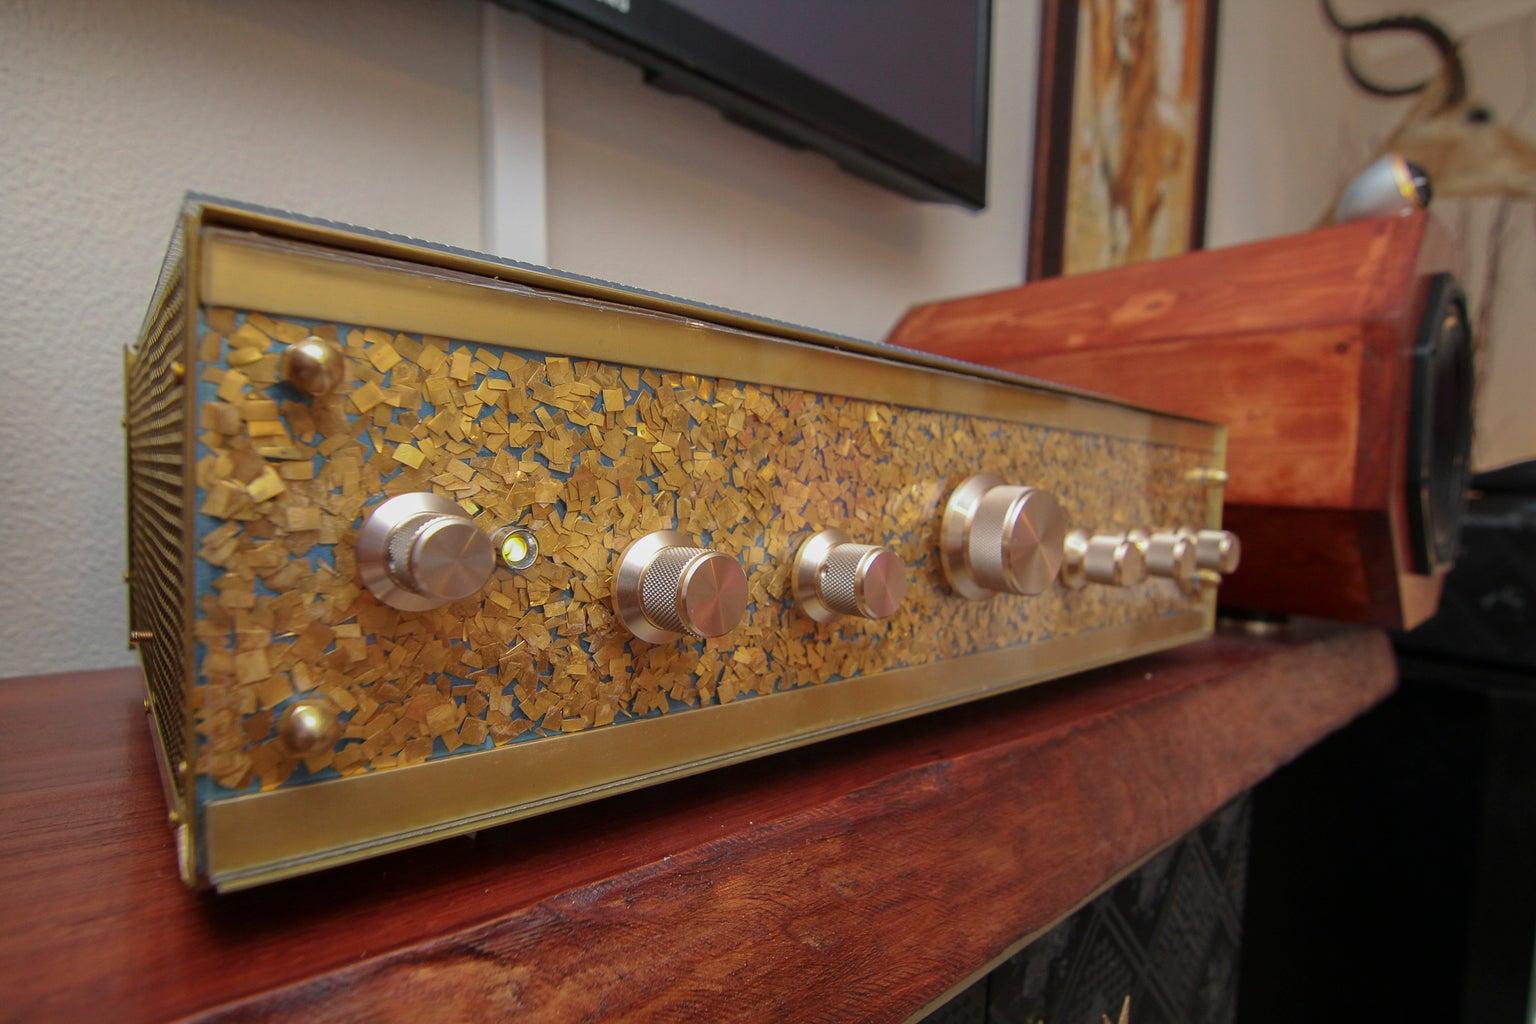 The Skeleton Amplifier Cabinet